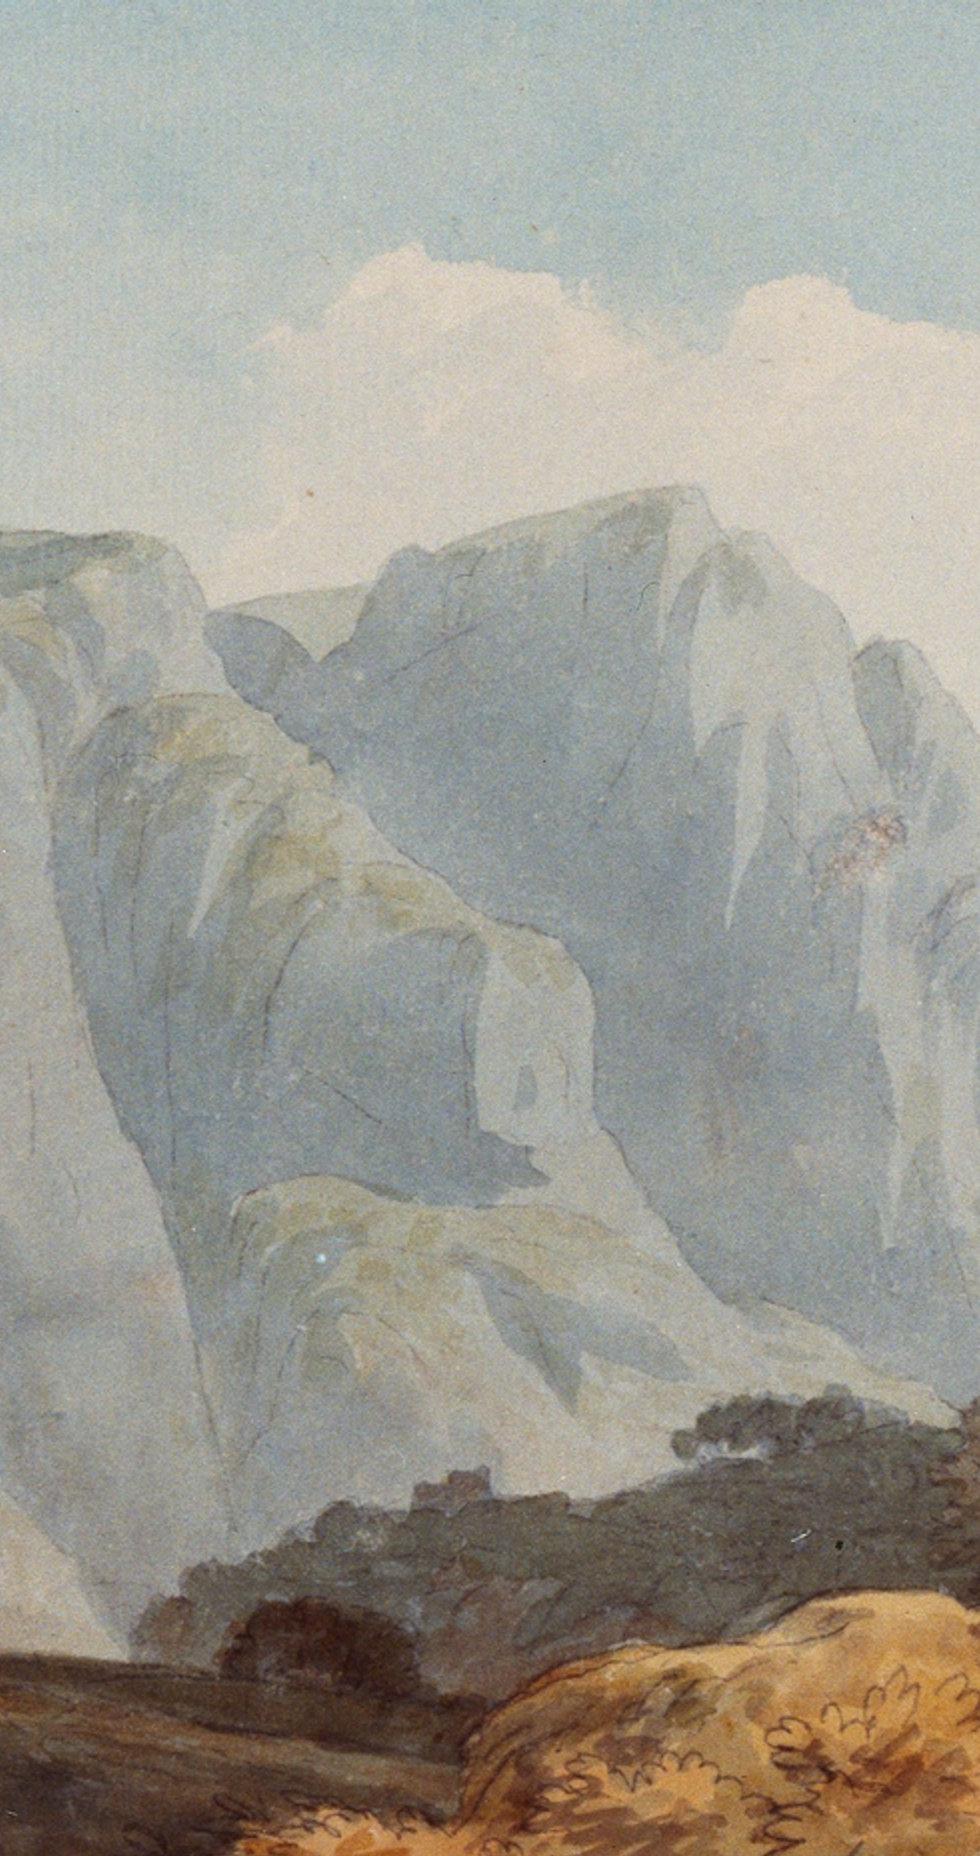 Image by Birmingham Museums Trust